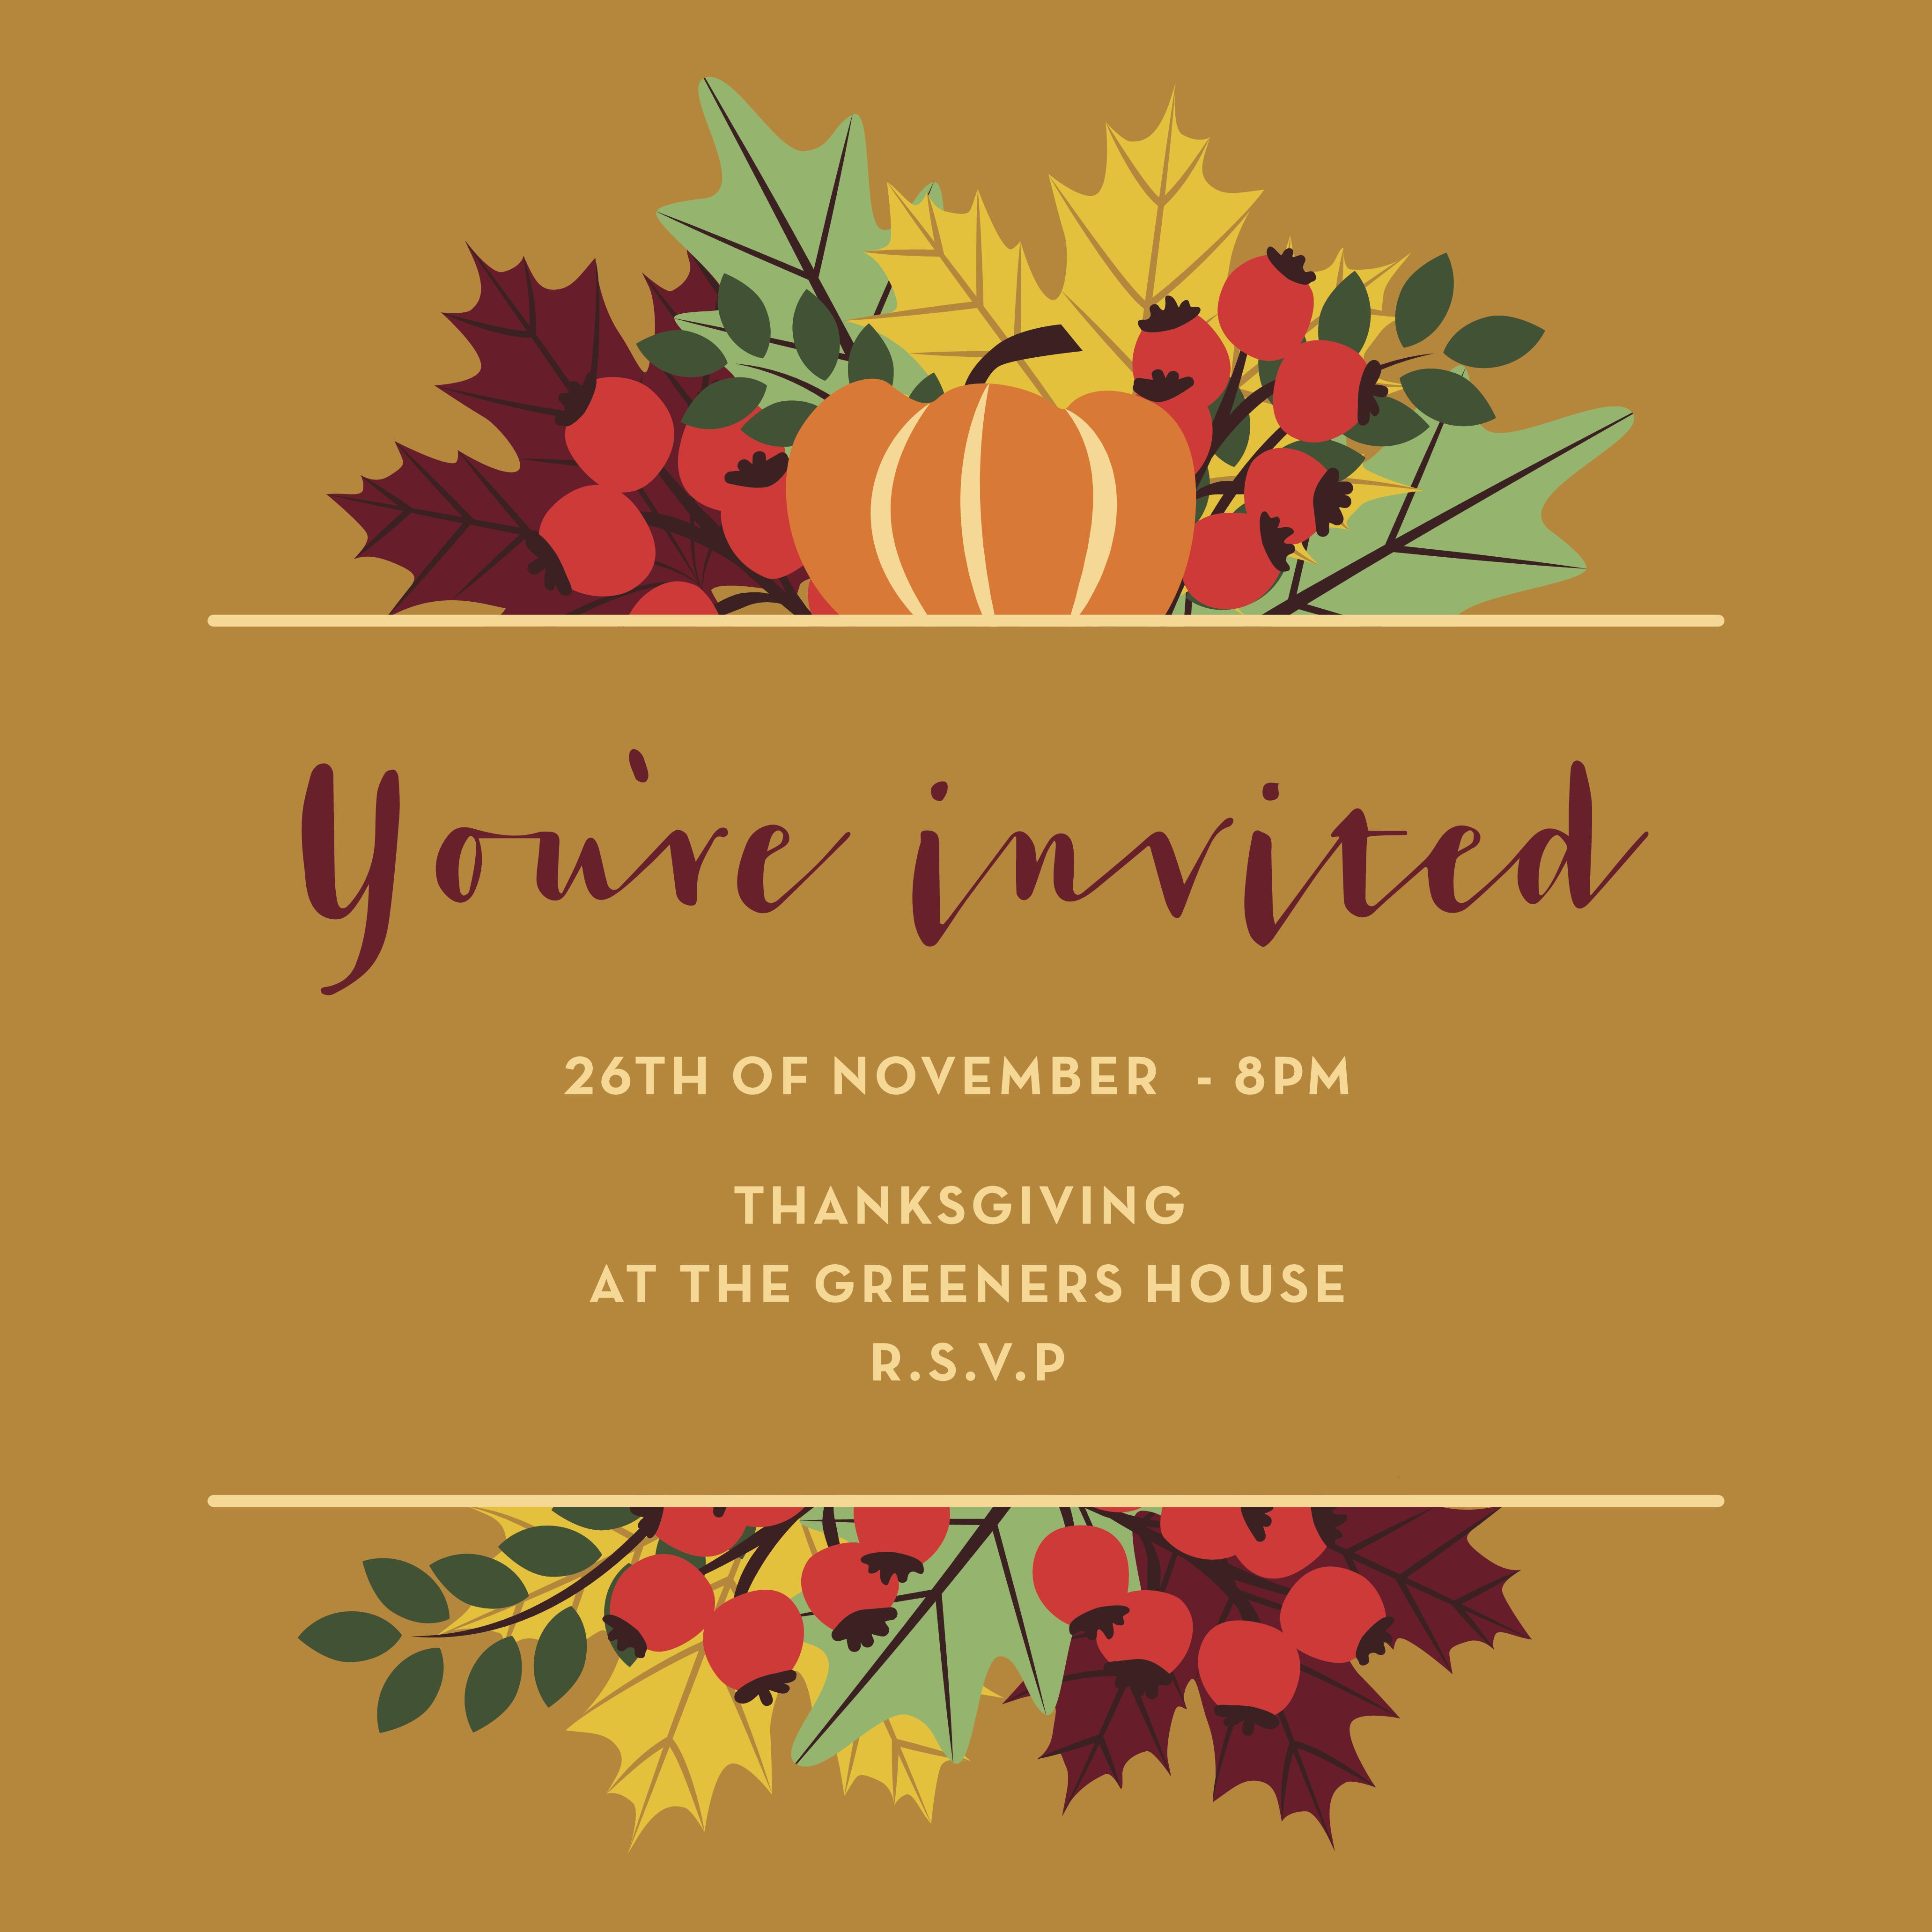 Read invitations carefully.